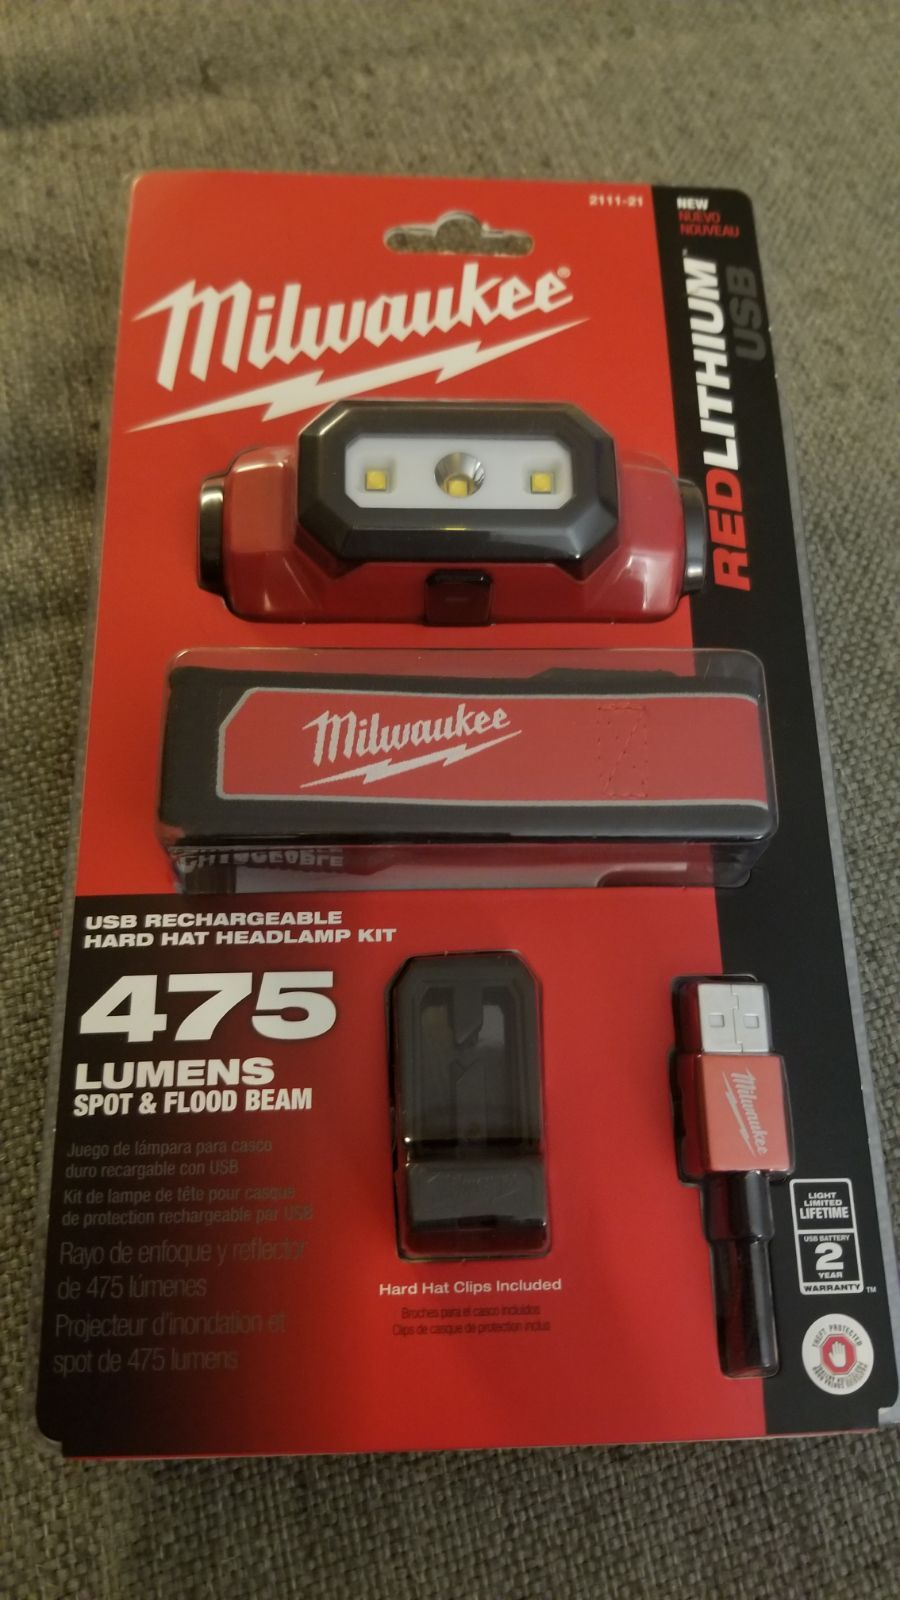 Milwaukee 475 Lumens Led Rechargeable Hard Hat Headlamp Milwaukee 500 Lumens Led Pivoting Rechargeable Flash Milwaukee Rechargeable Flashlight Milwaukee Tools